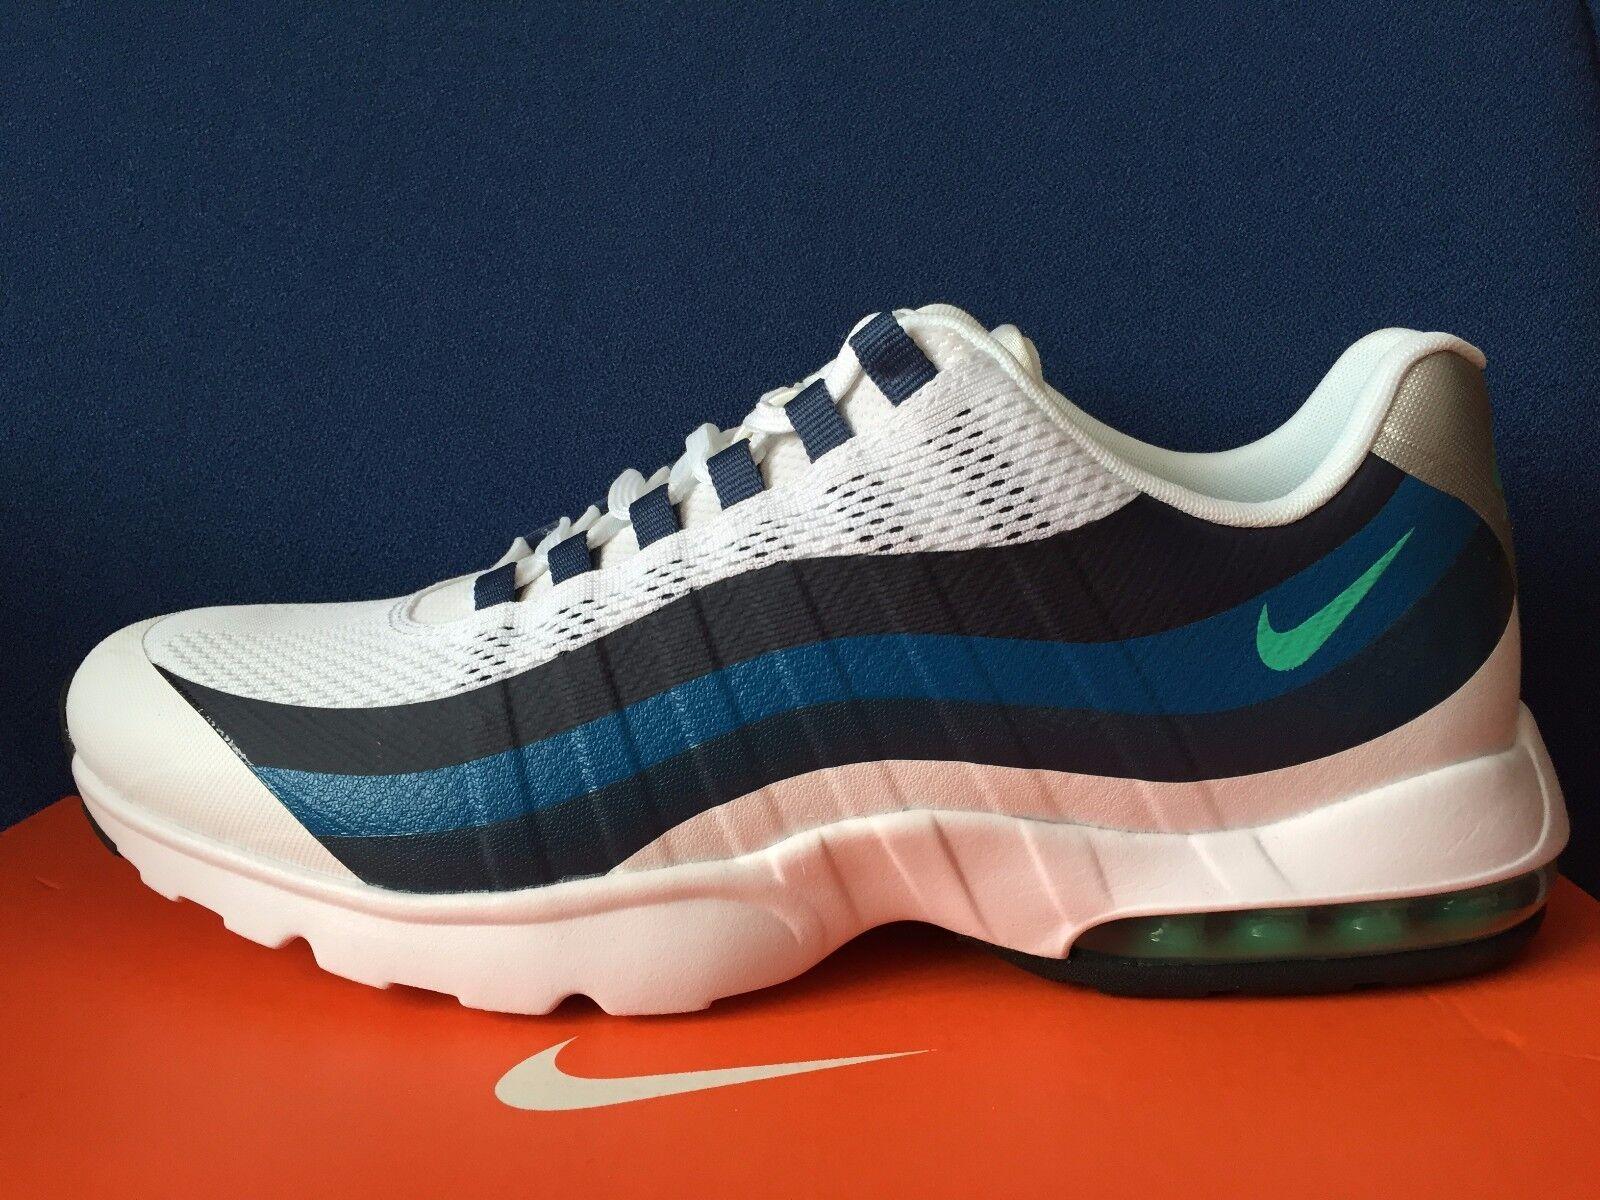 New Women's Nike Air Max 95 Ultra Running shoes 749212 100 White bluee Sz 12